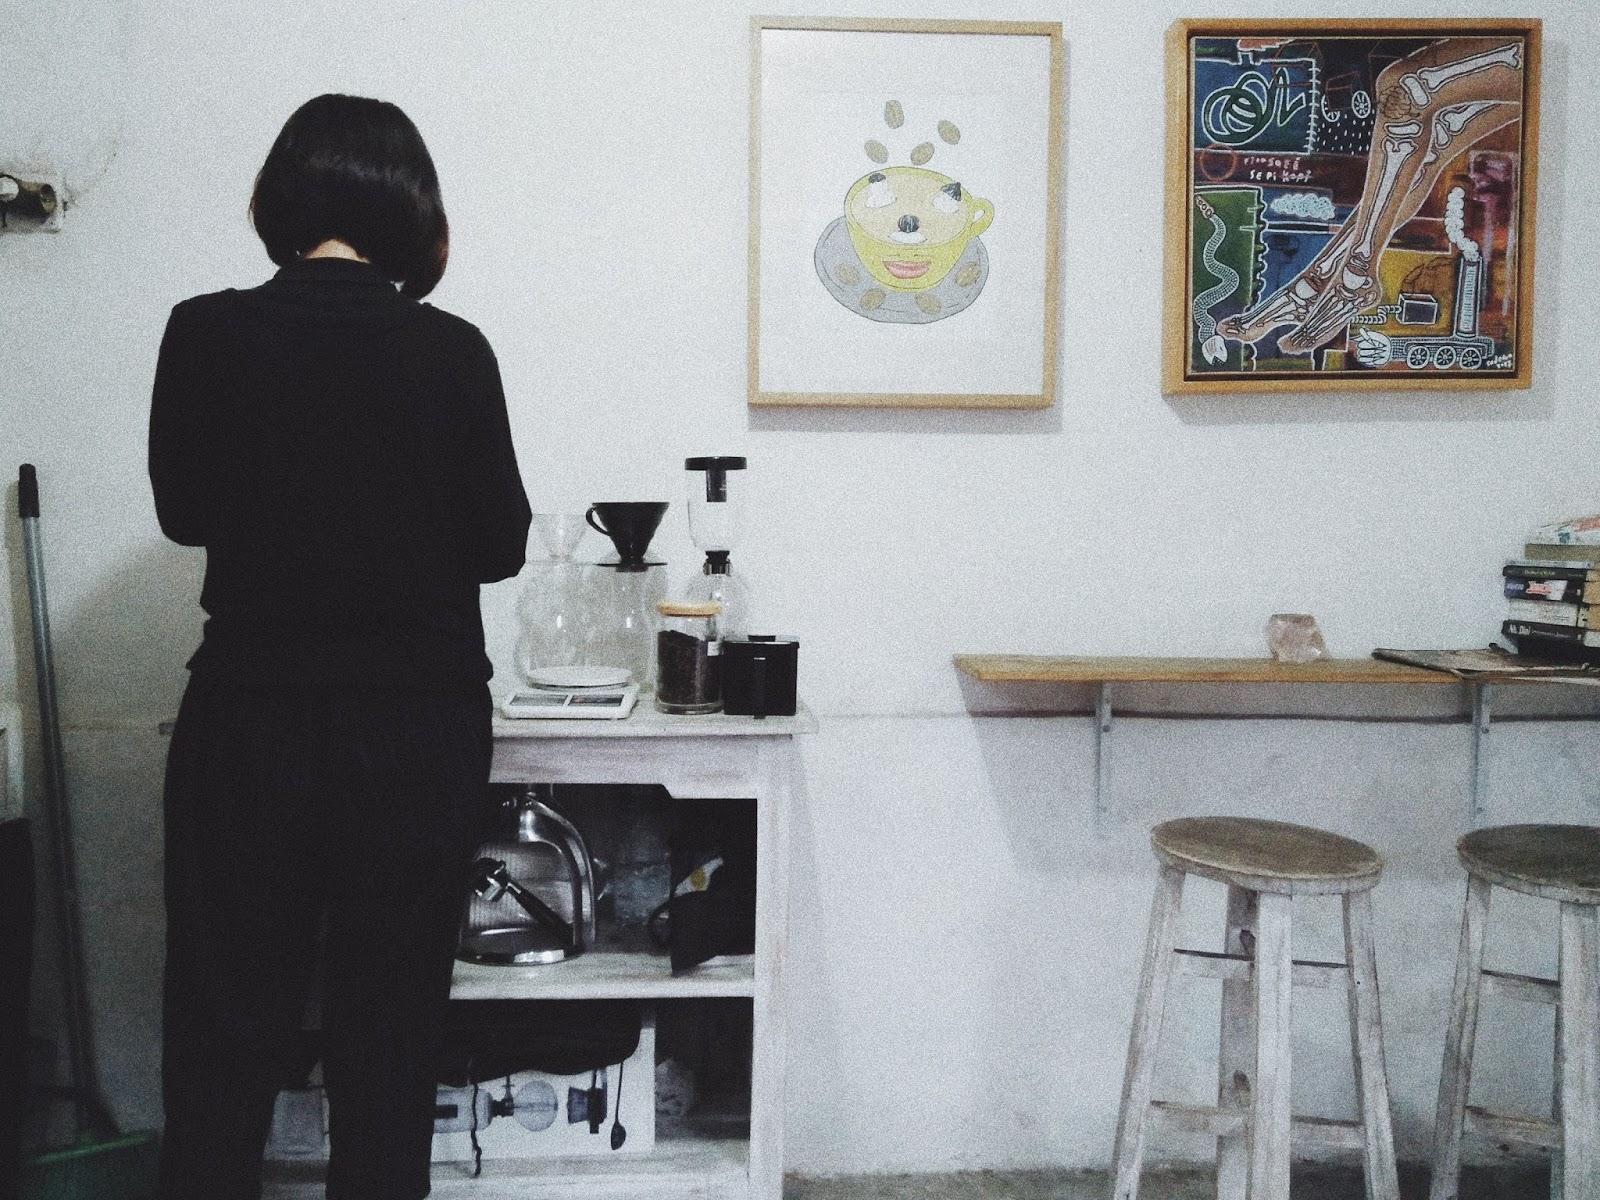 Menyusuri Prawirotaman Jogja : Hidup Ketika Pagi, Redup Kala Malam Menanti - Kiosk Coffee Parangtritis